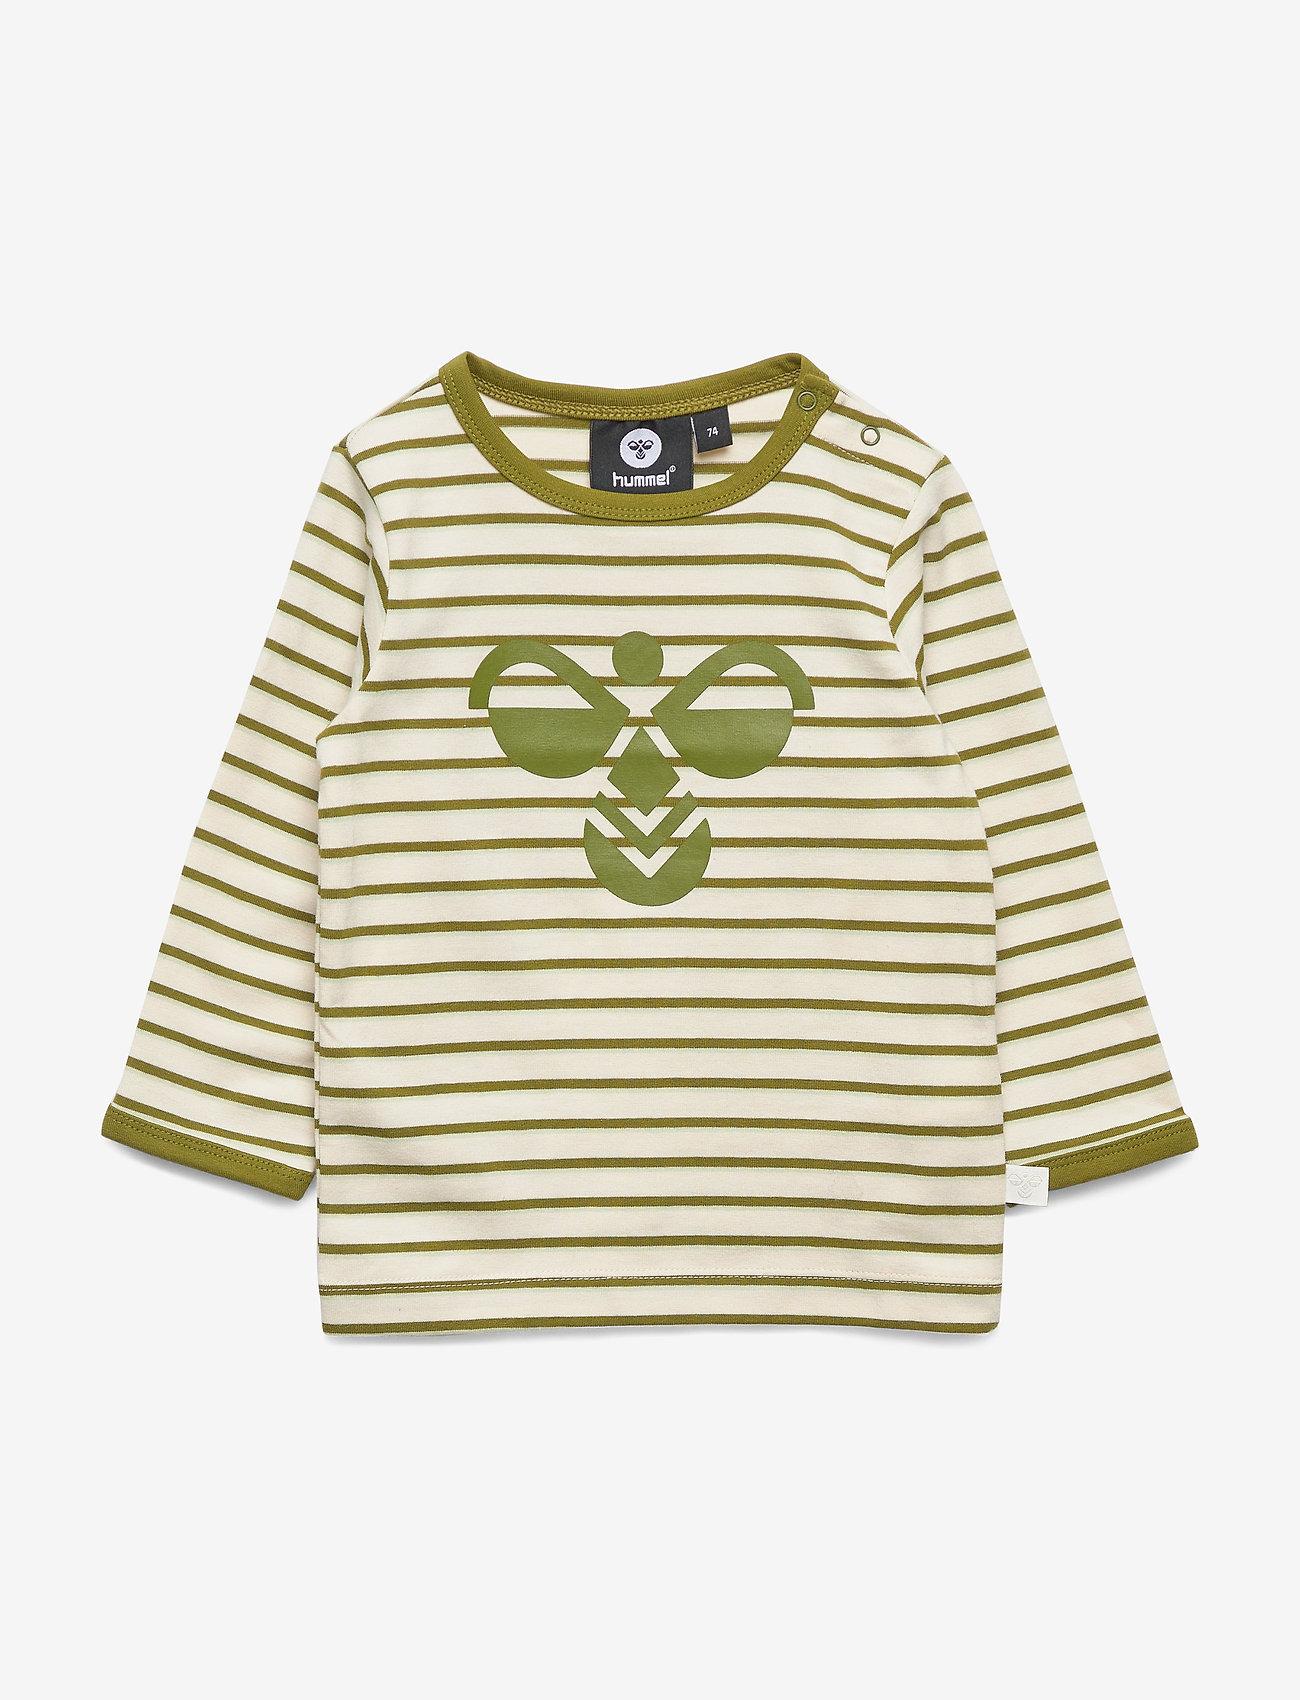 Hummel - hmlALAN T-SHIRT L/S - long-sleeved t-shirts - pesto - 0